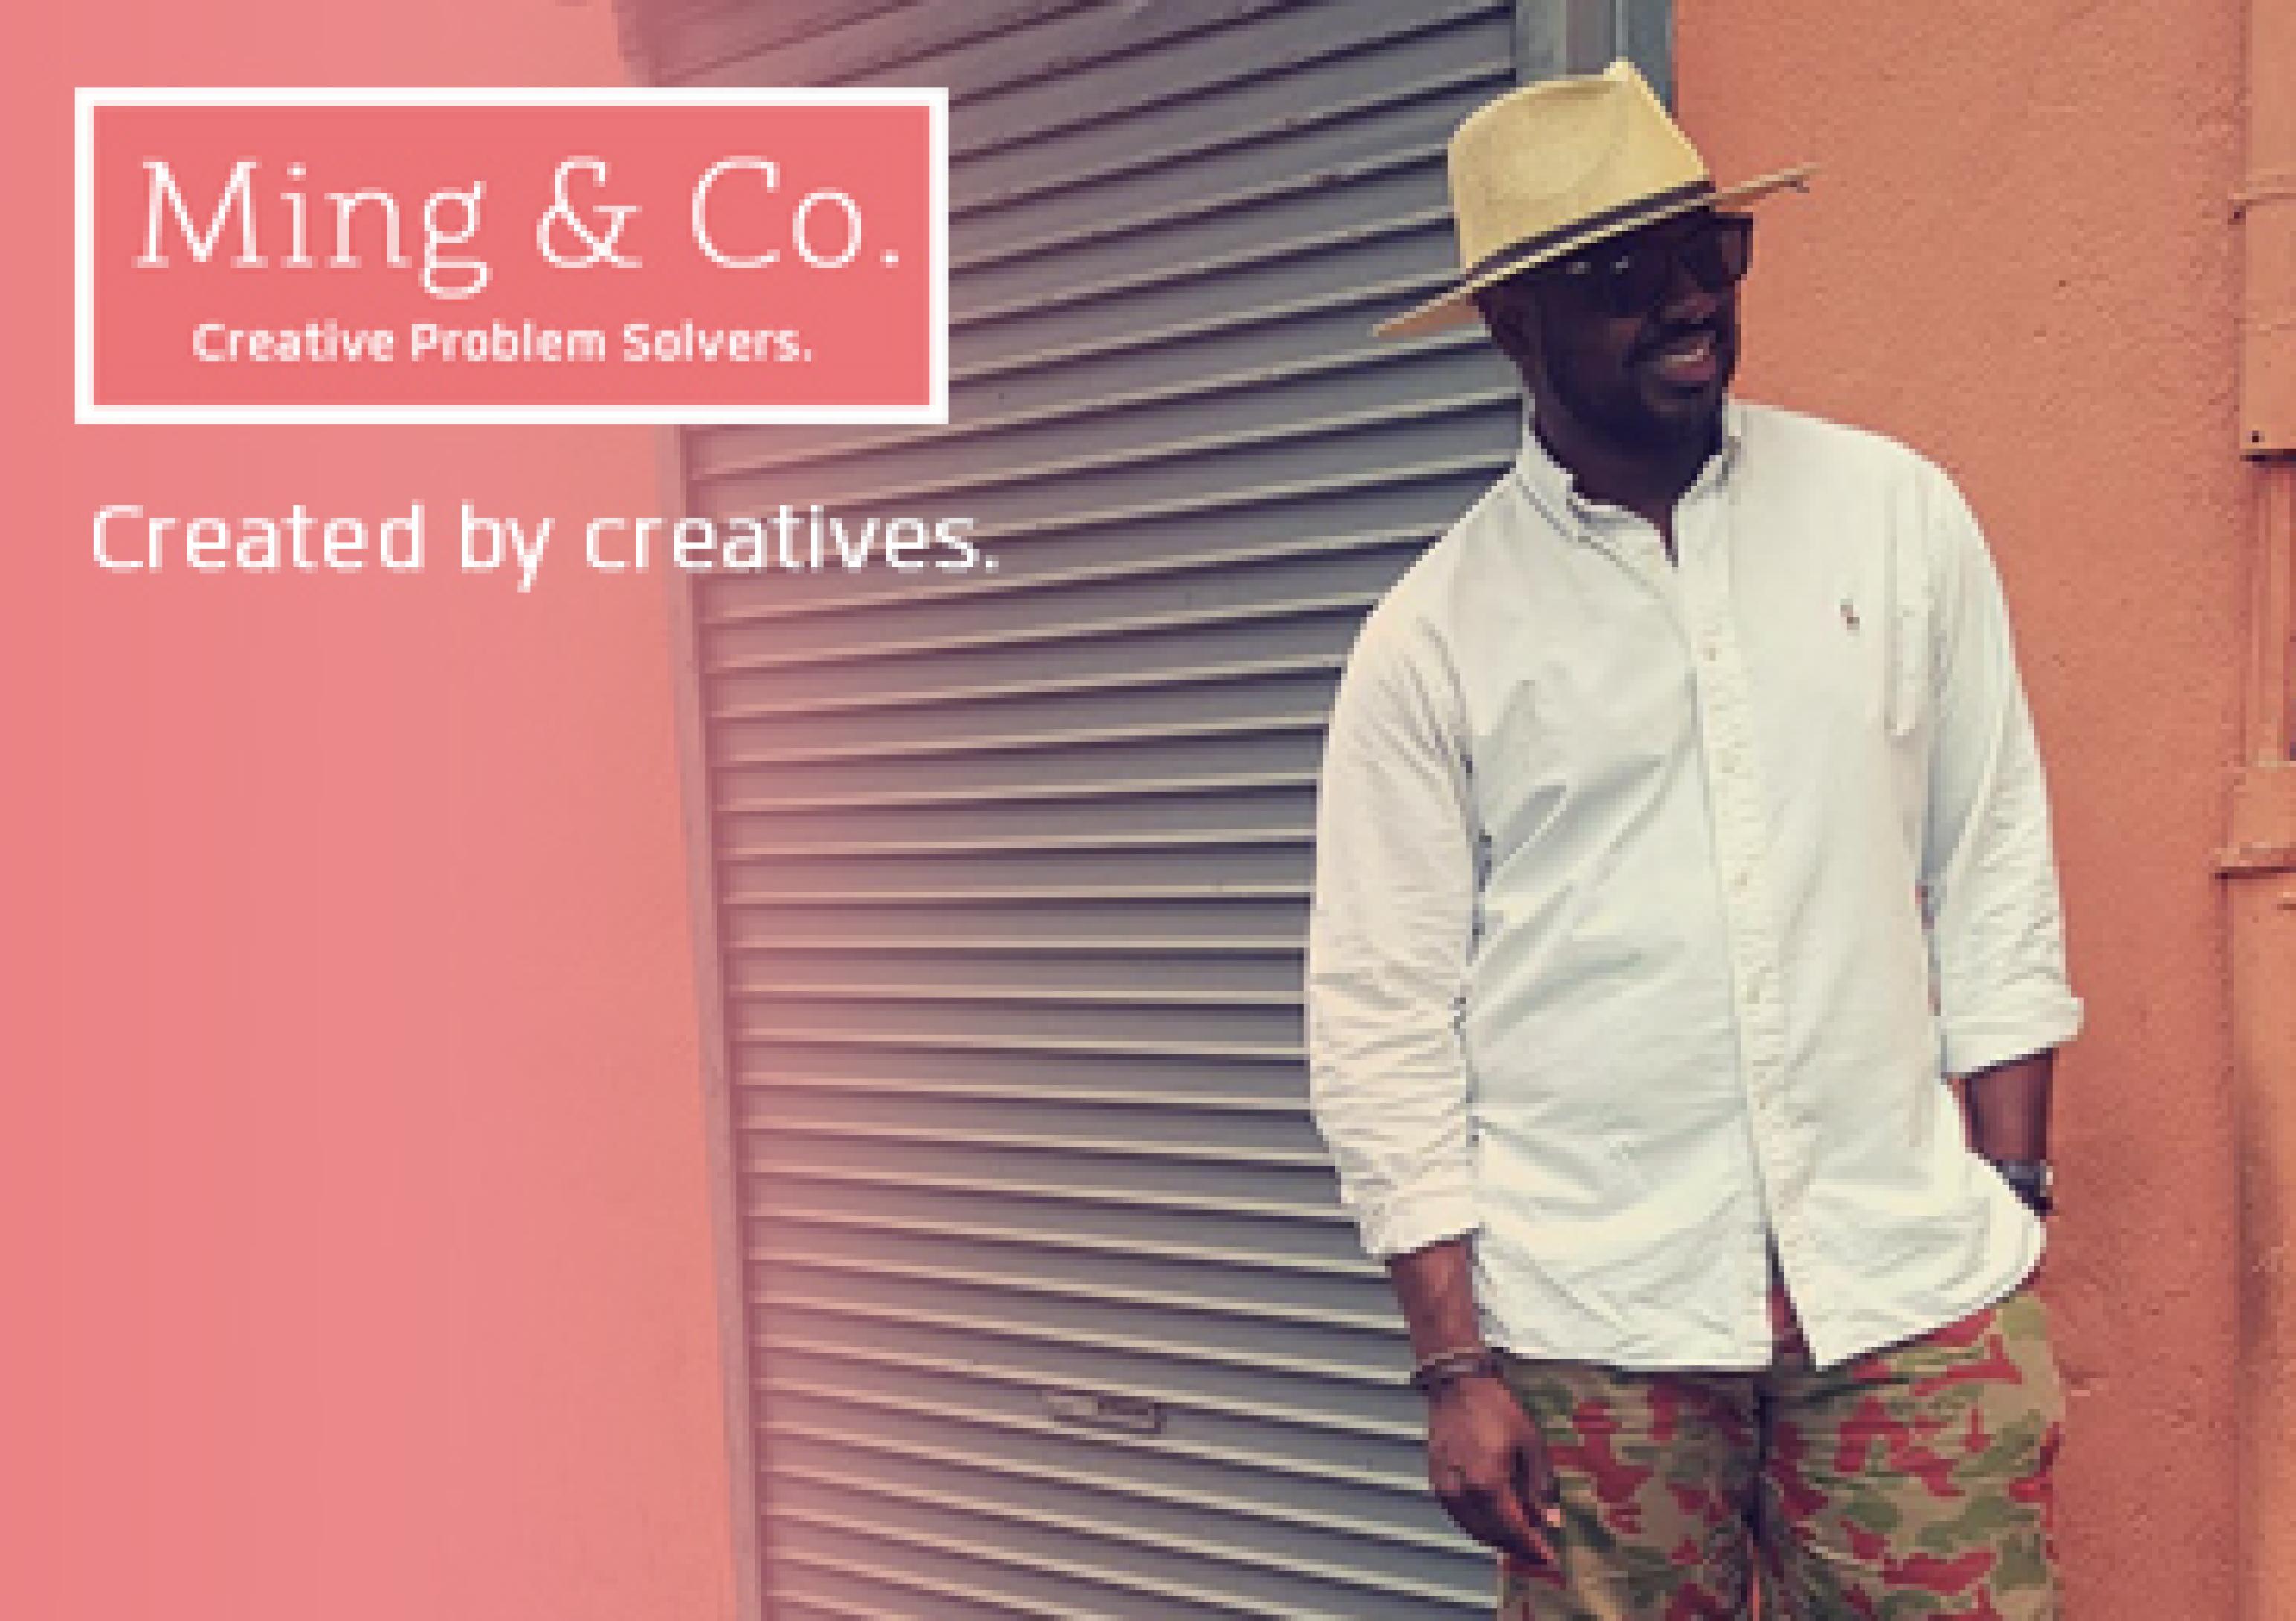 Ming & Co. Design